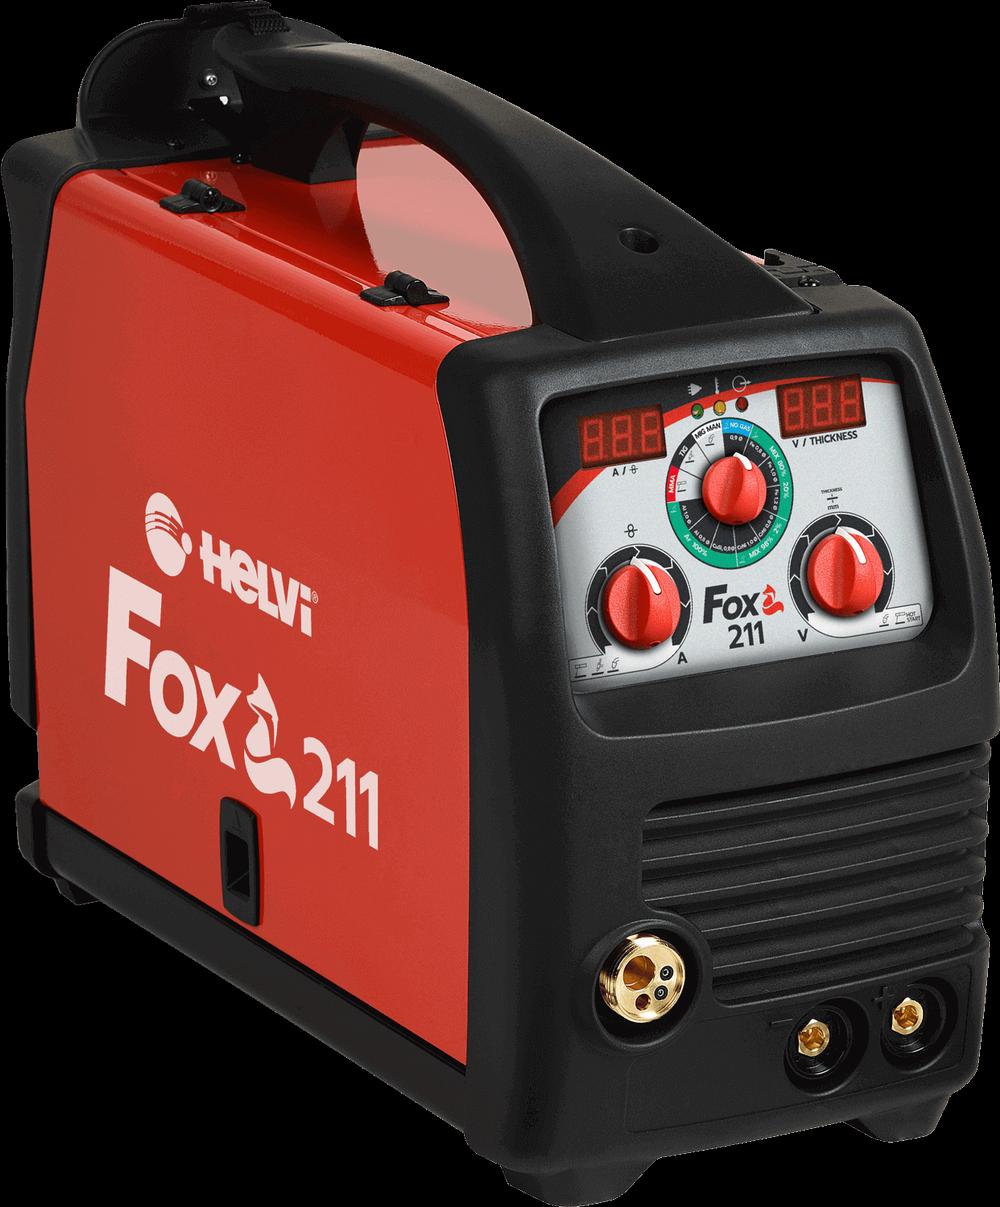 Helvi FOX 211 DIGITAL